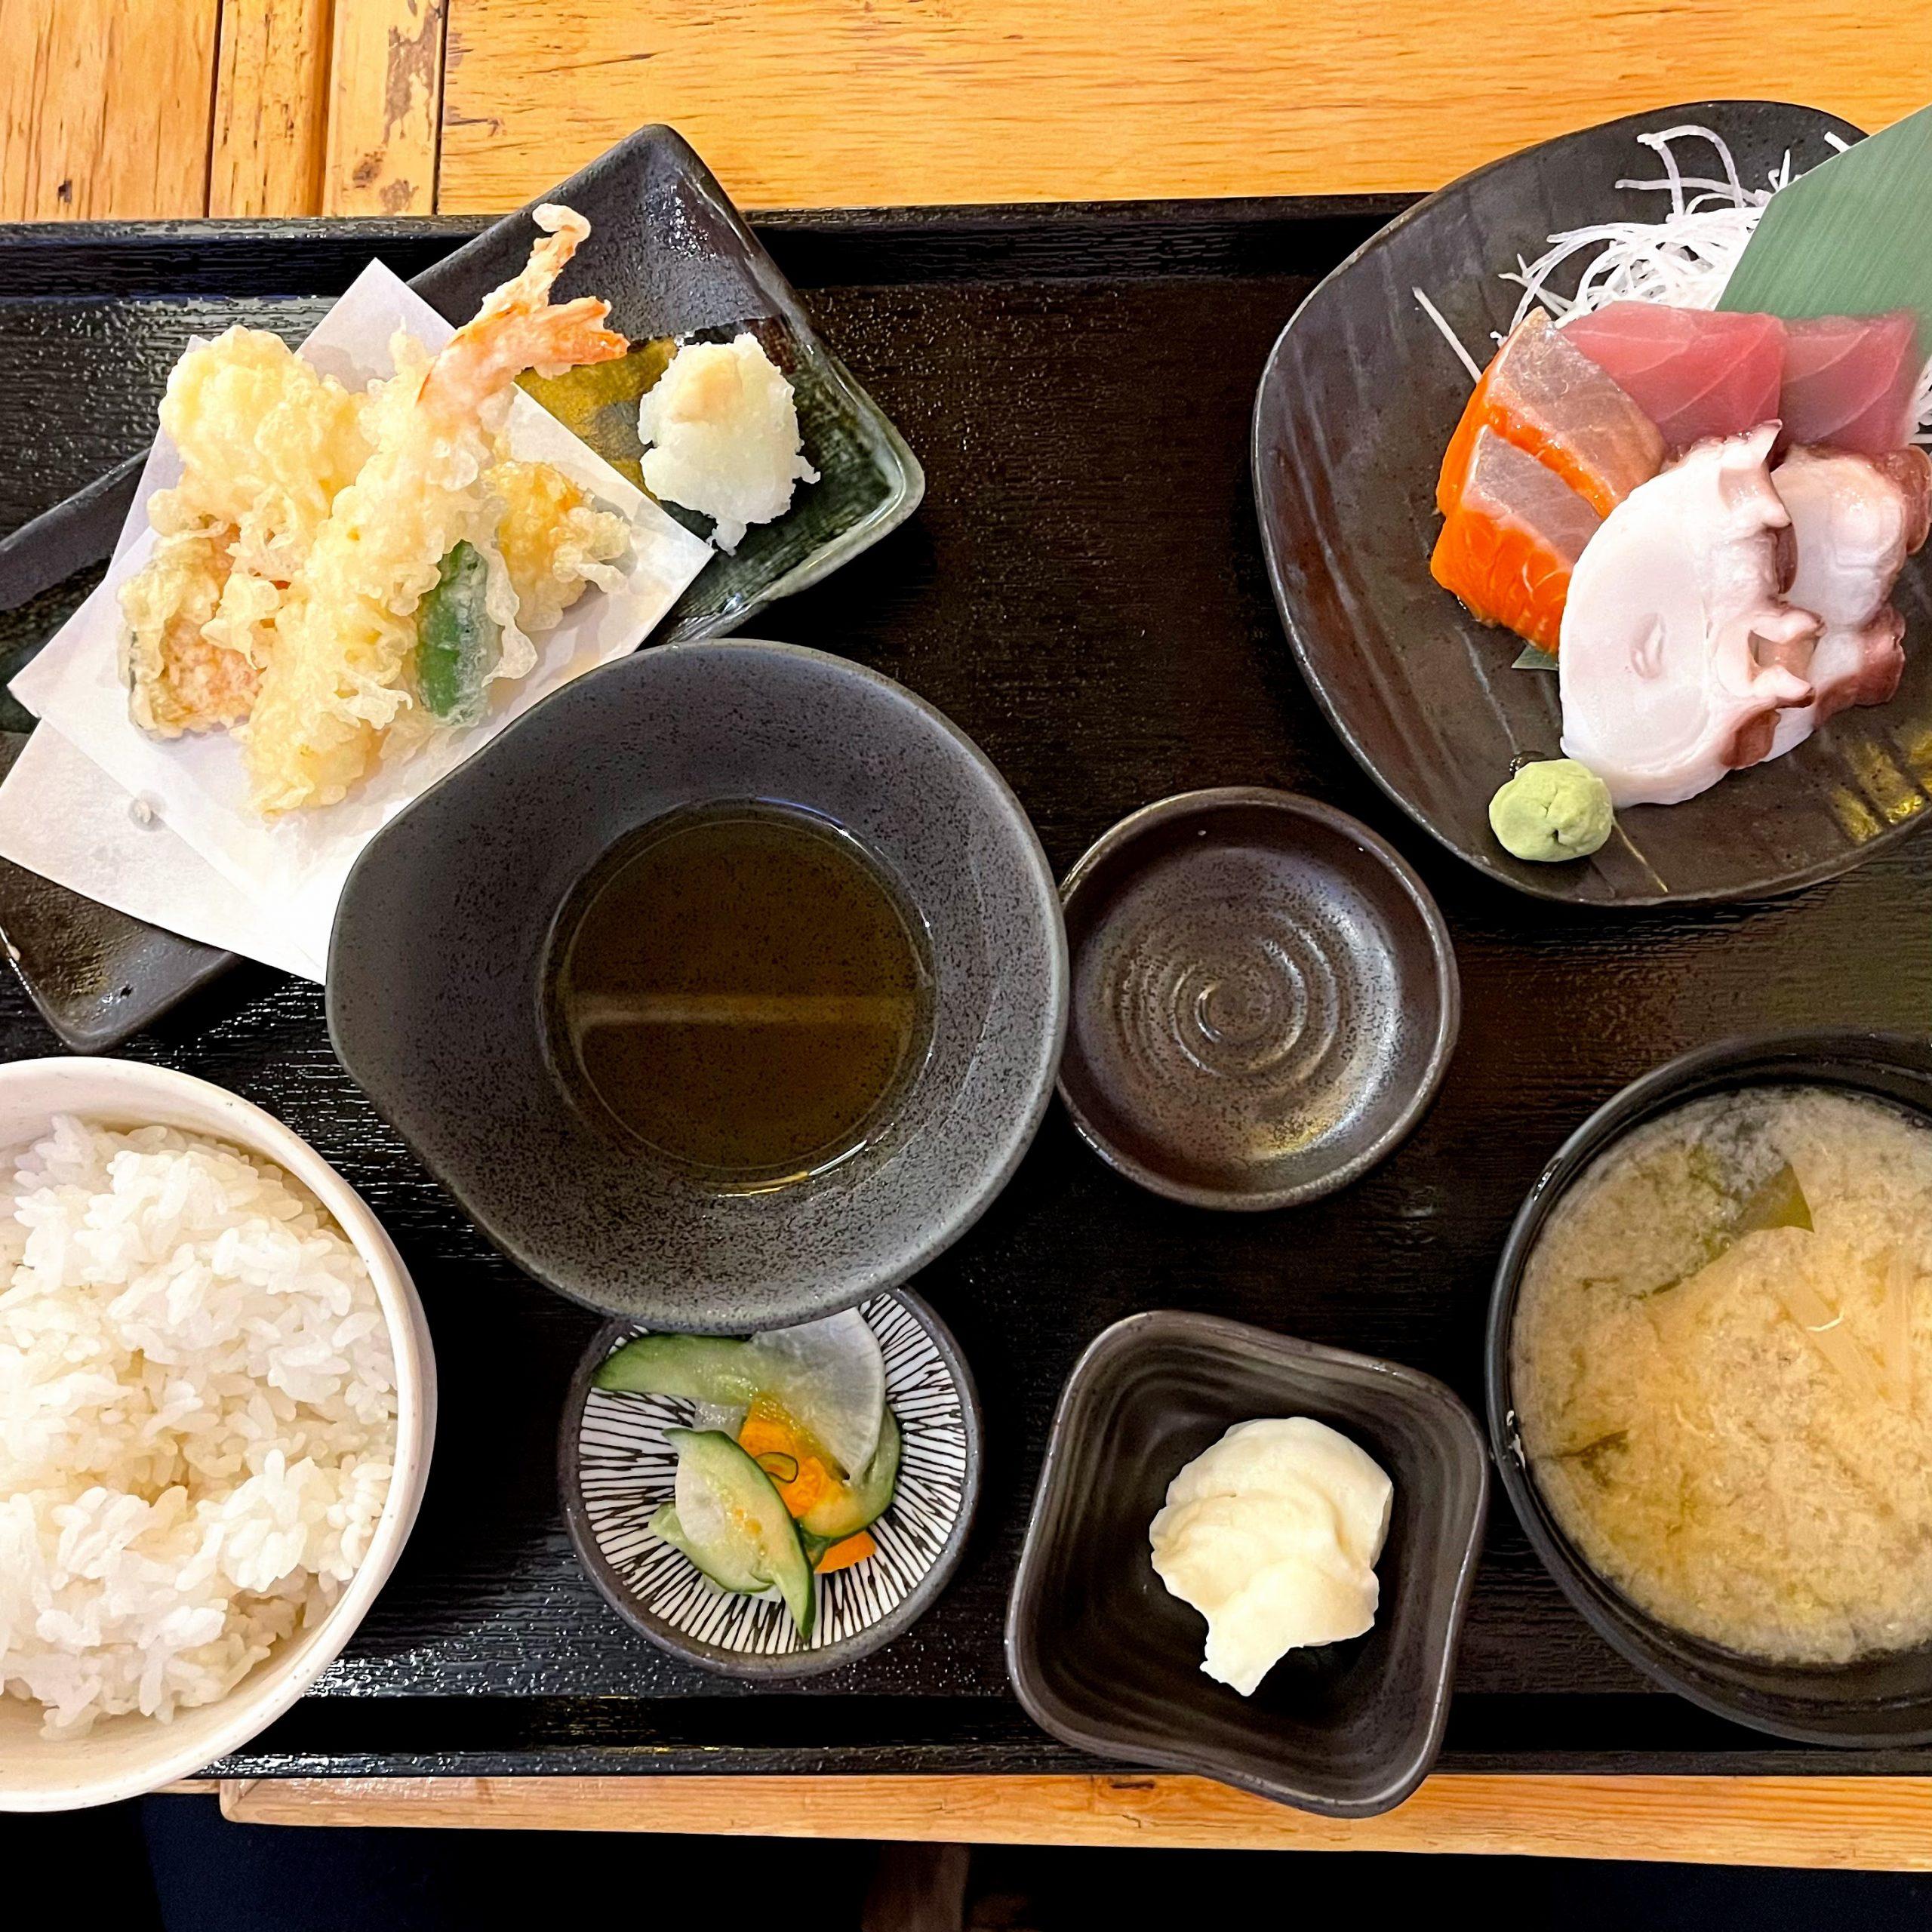 恵比寿商店の恵比寿御膳